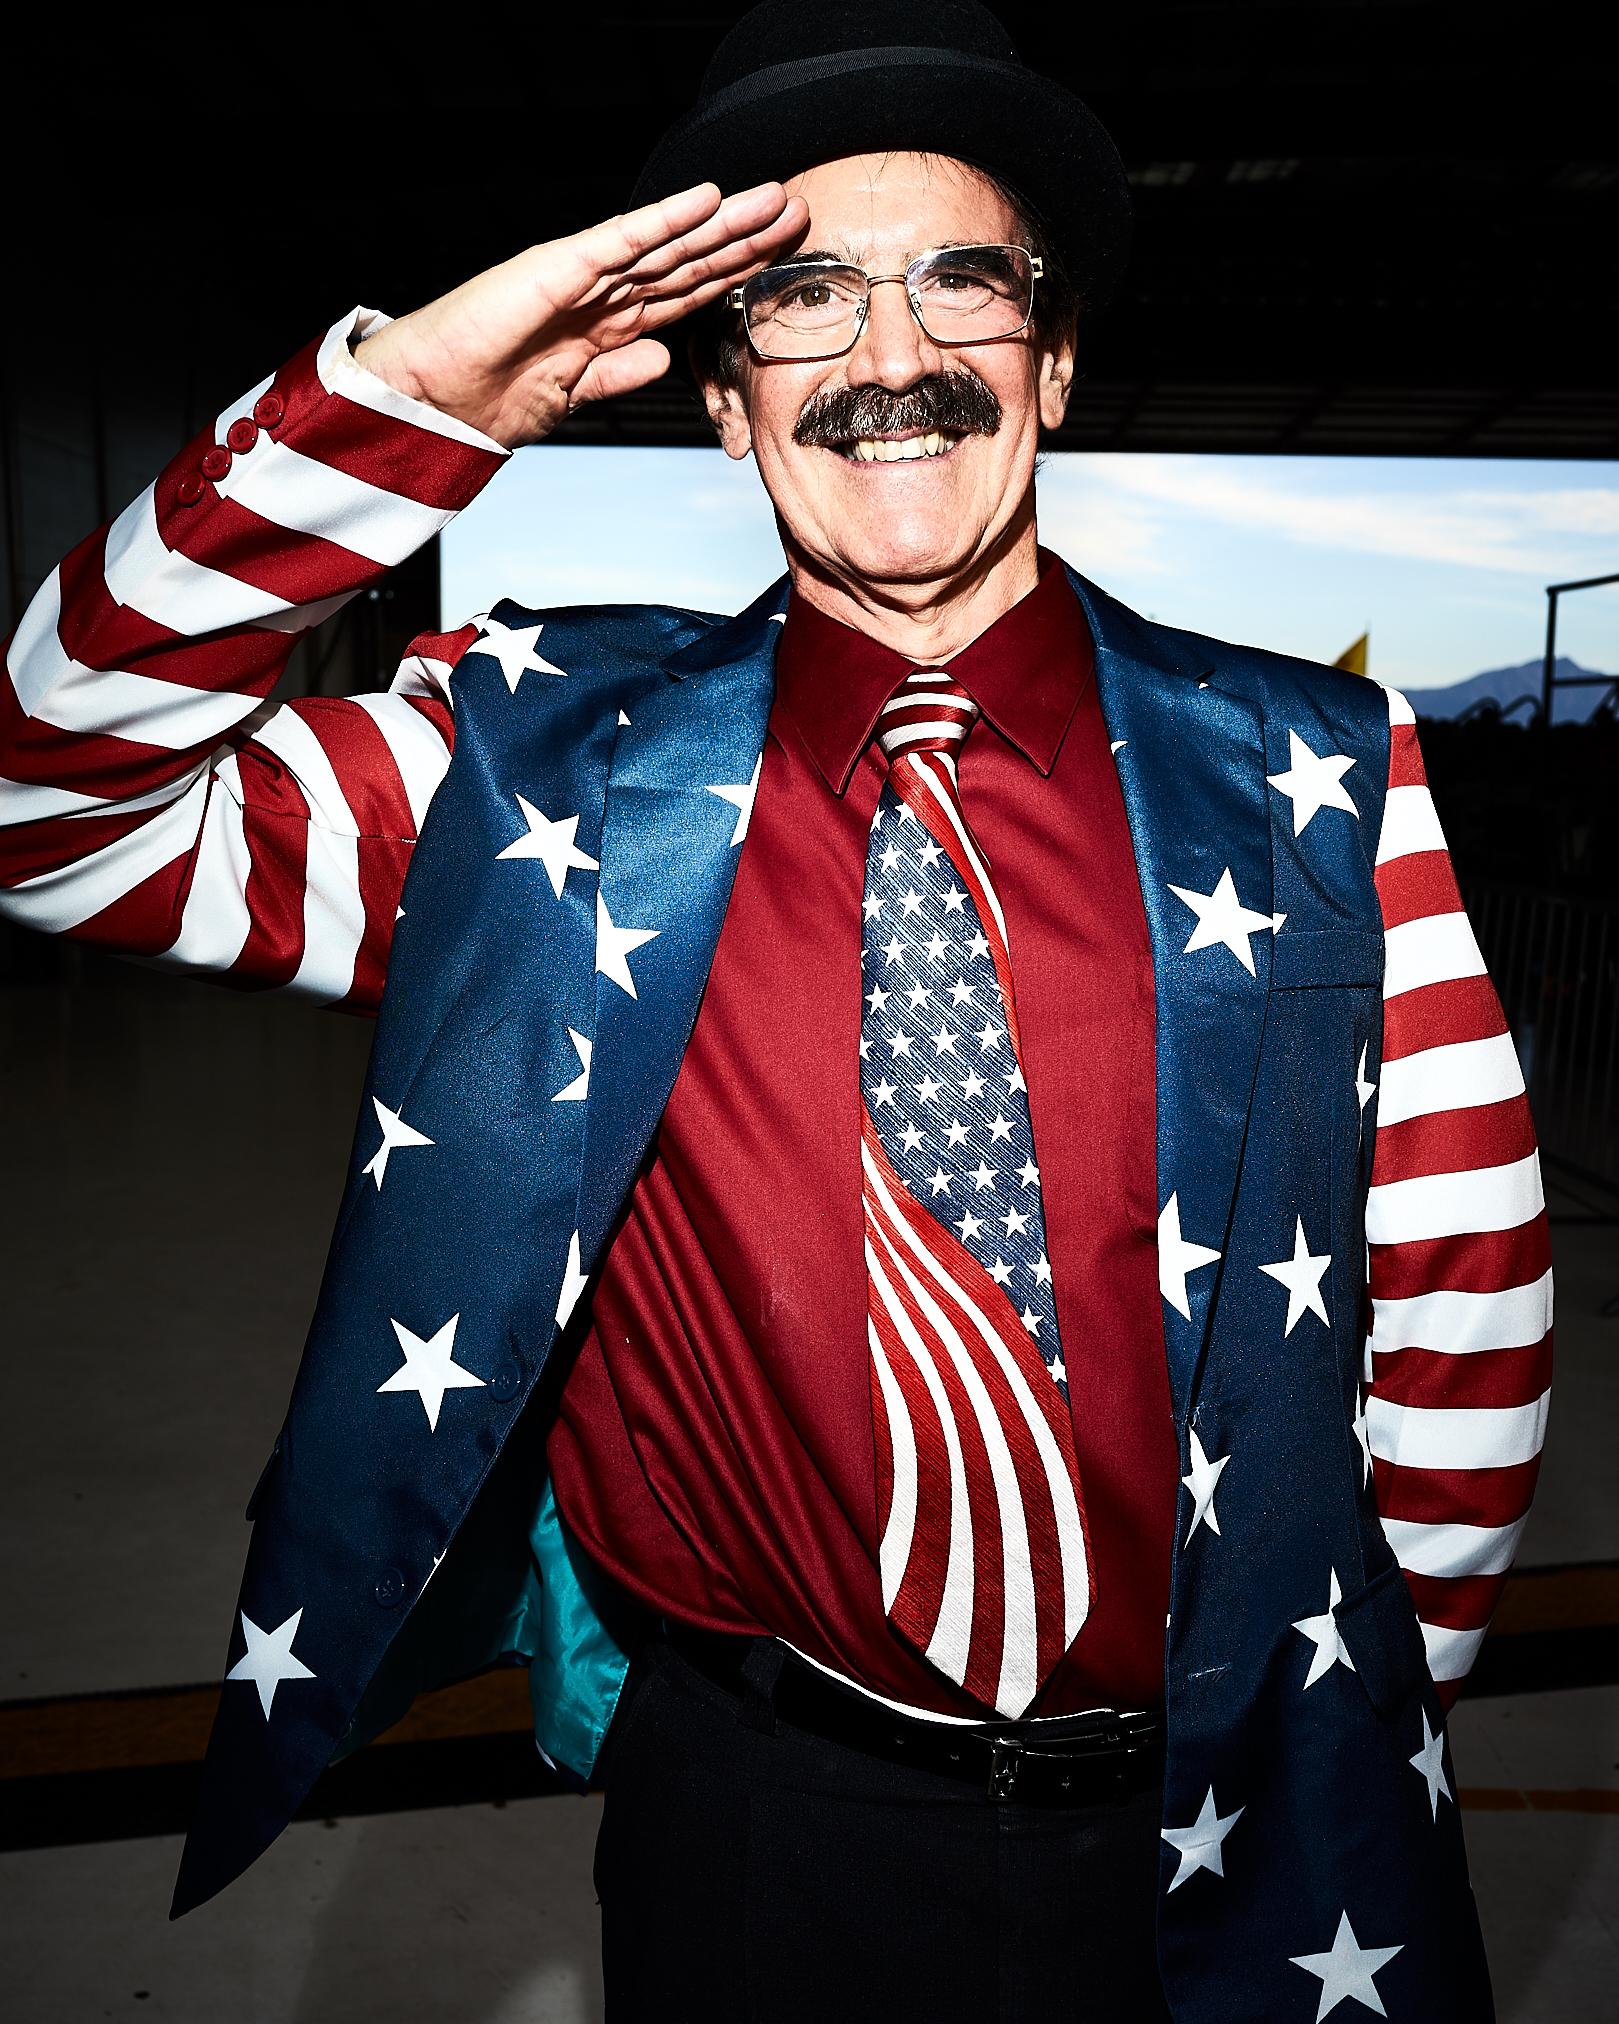 Wearing the American Flag by Peter Adams.